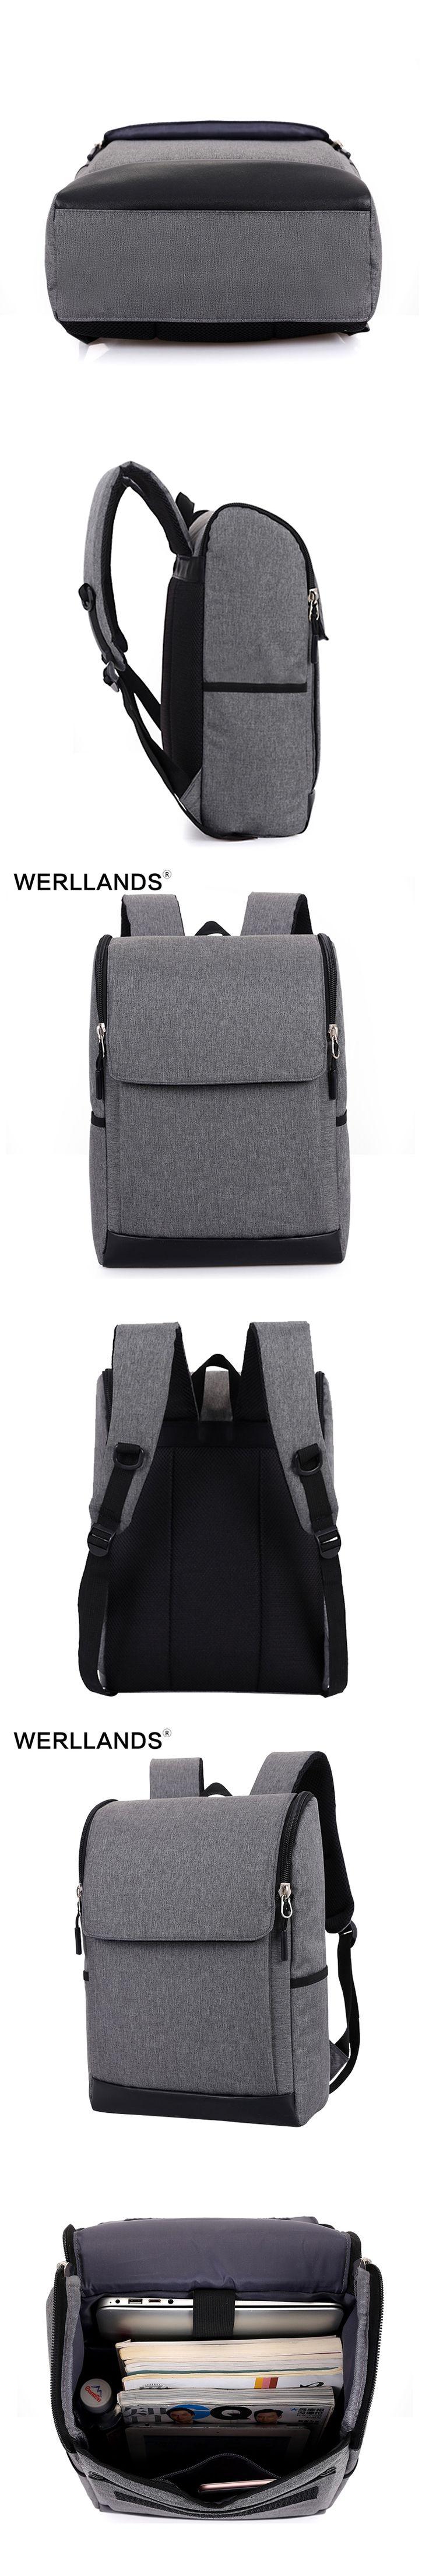 WERLLANDS Small Backpack for Men Korean Style Notebook Mini School Bag For Boys College teen Backpacks Waterproof Canvas Daypack